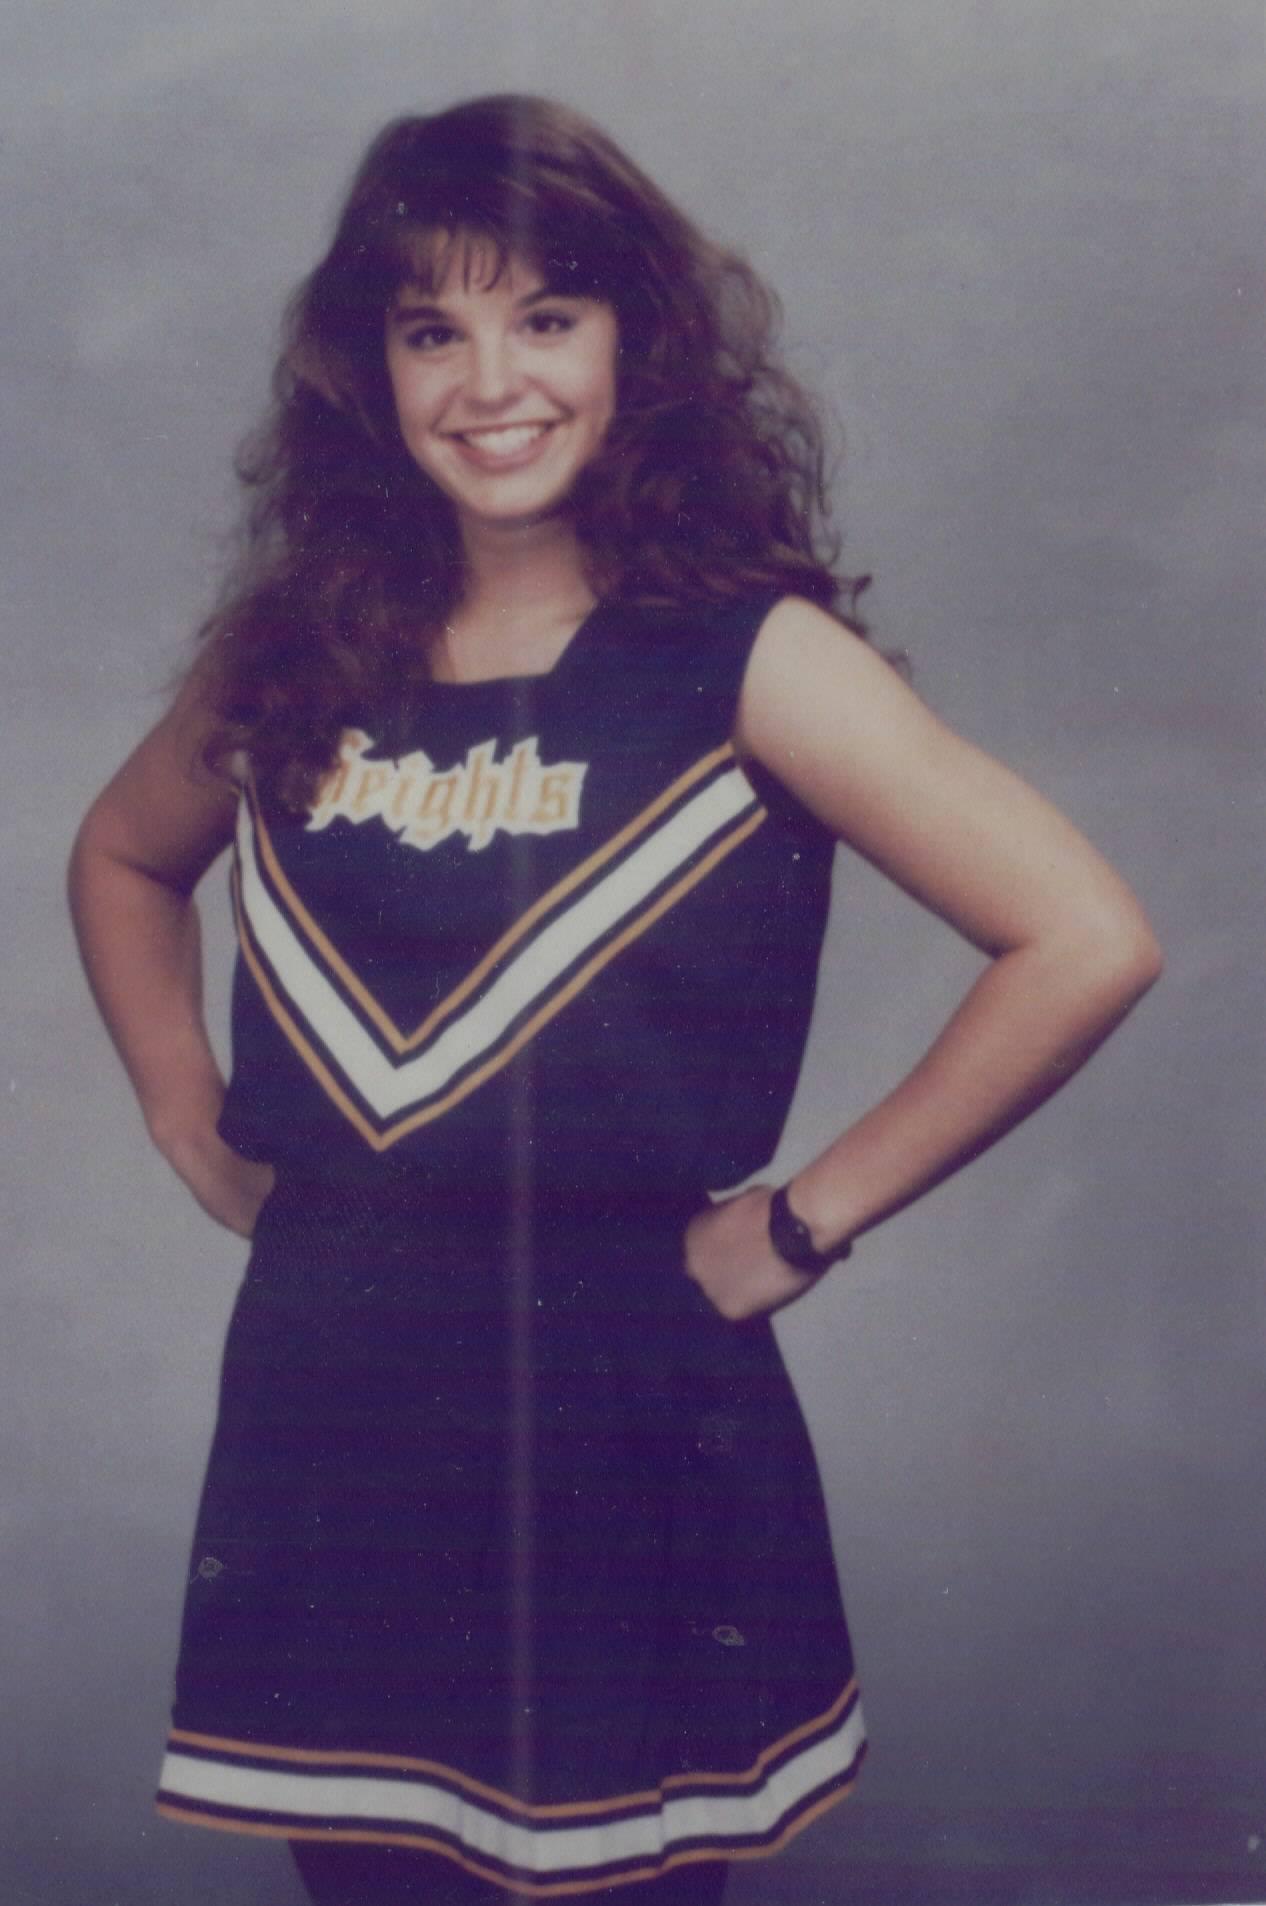 62 - Christy Stratton Mann - teen.jpg